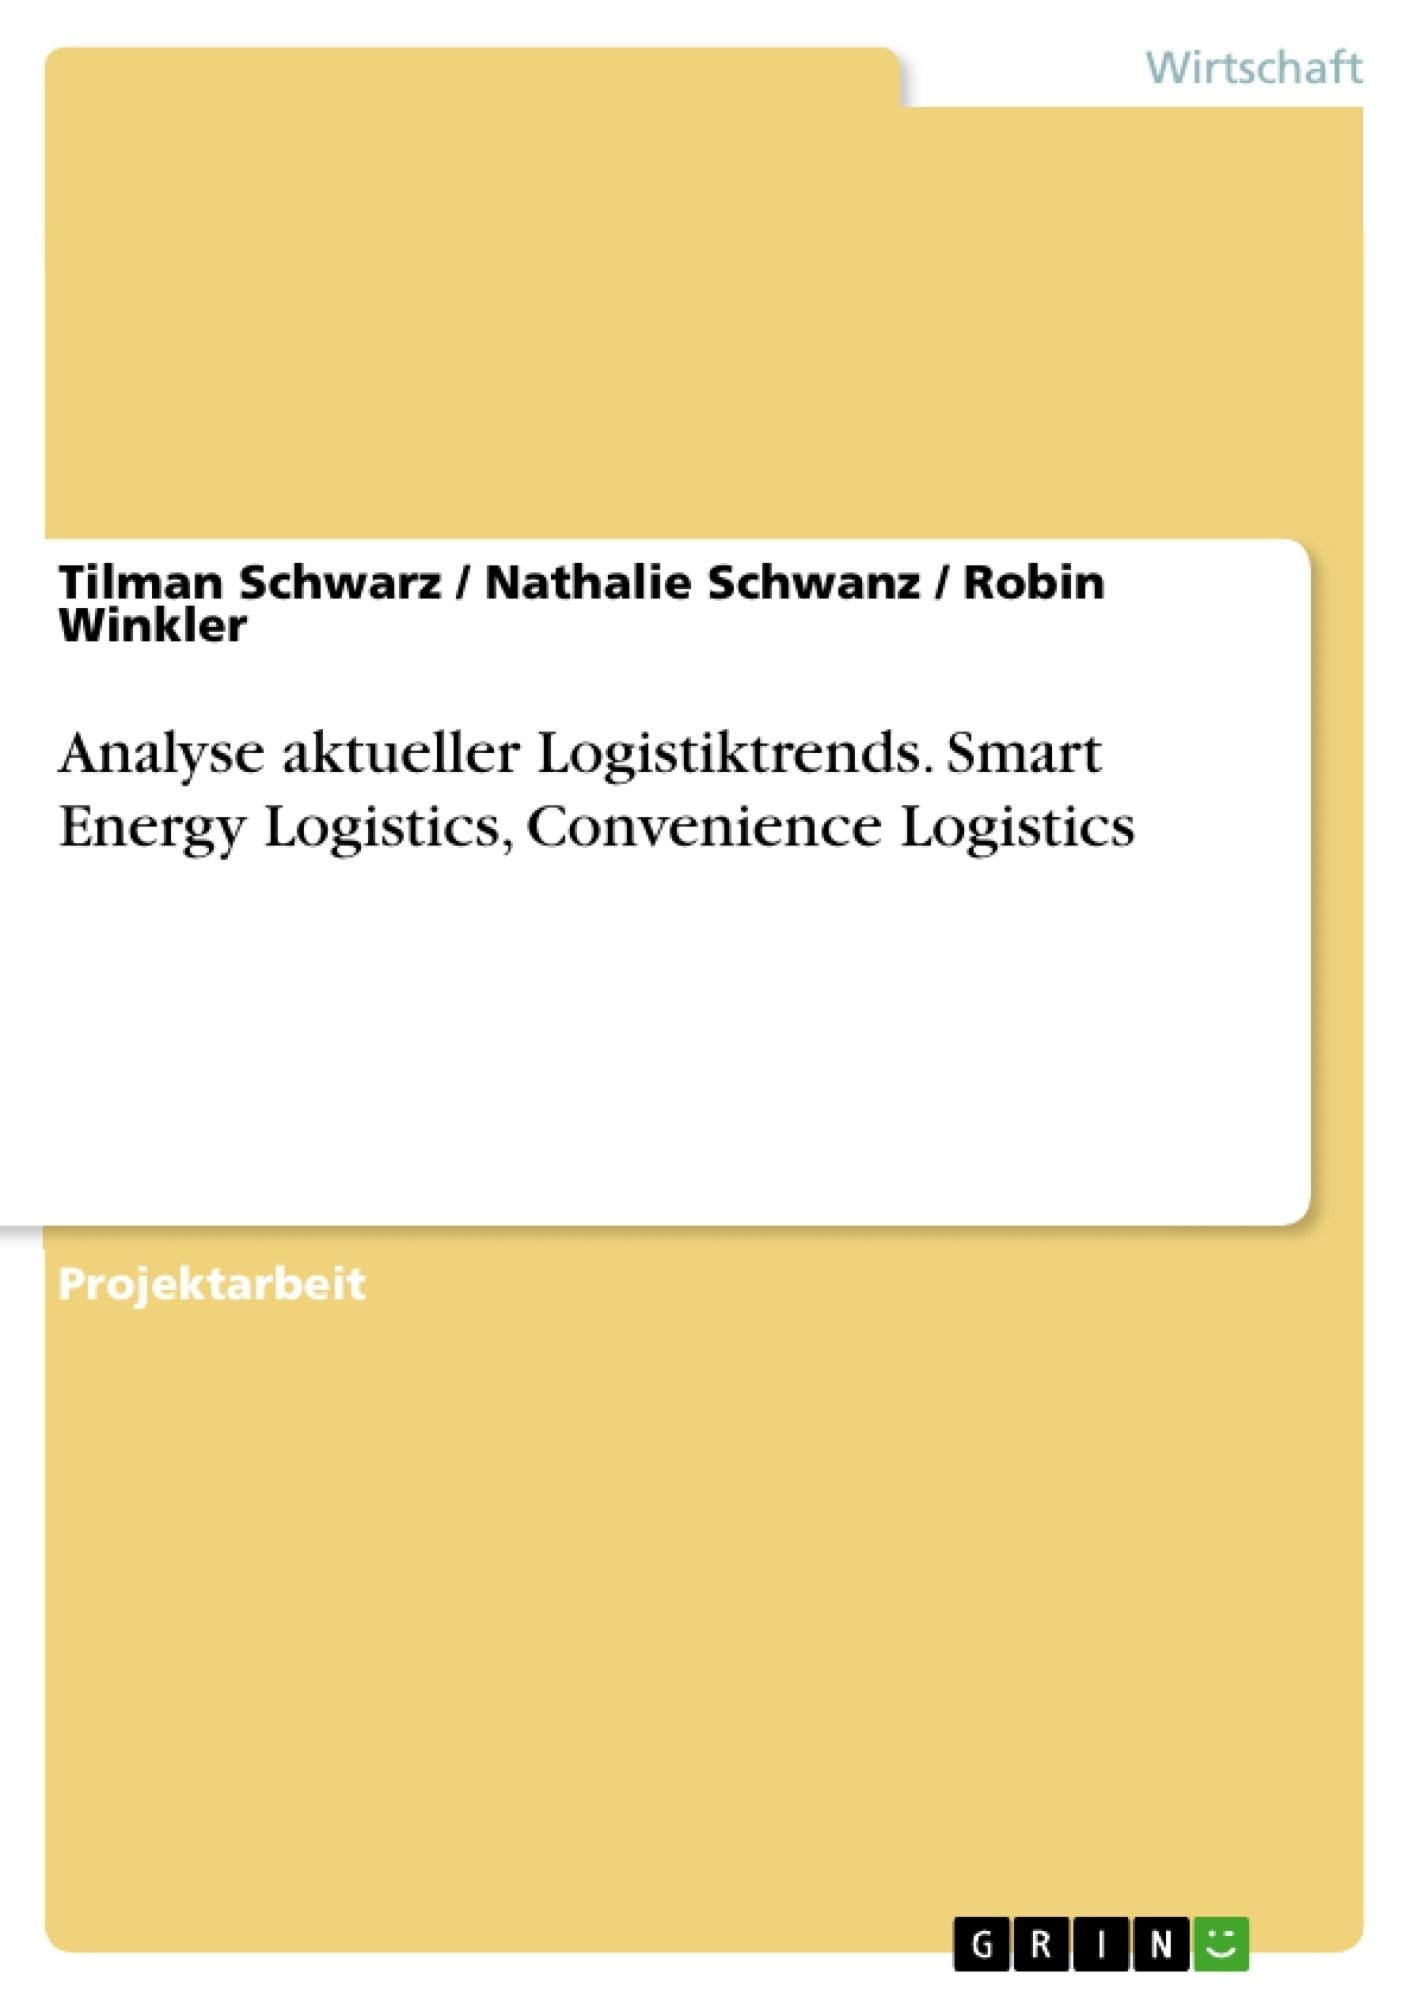 Titel: Analyse aktueller Logistiktrends. Smart Energy Logistics, Convenience Logistics